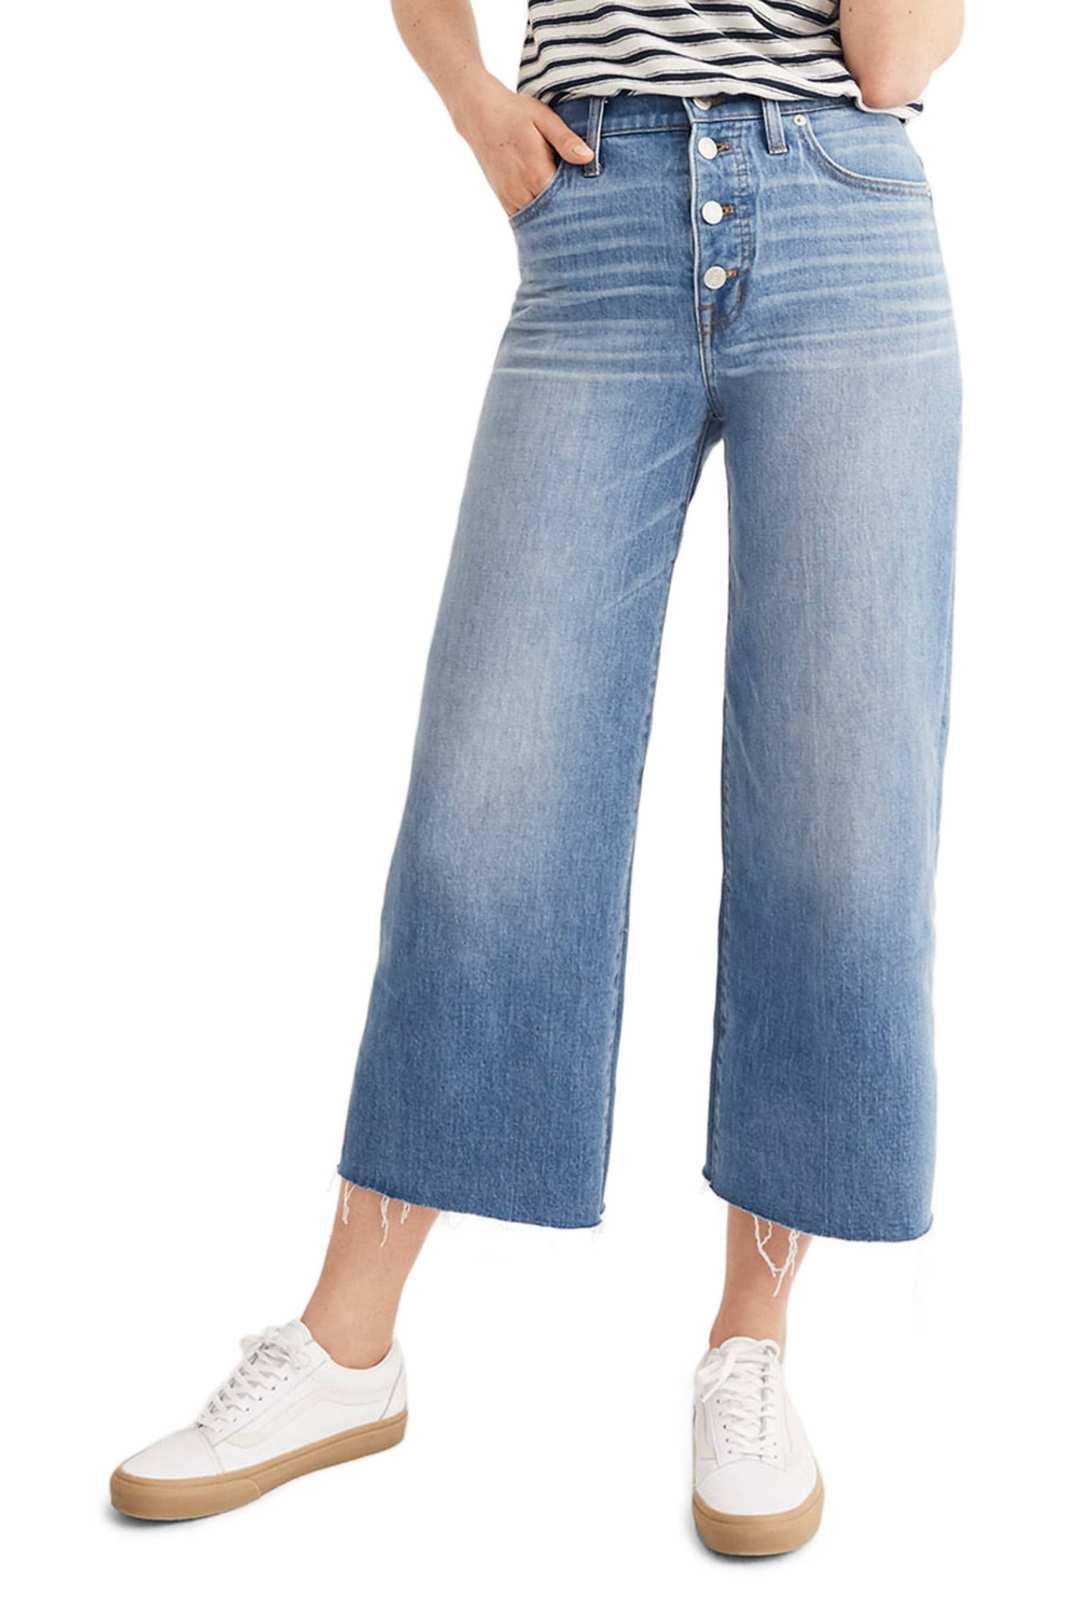 b148c3d58c7 Madewell Button Front Wide Leg Crop Jeans